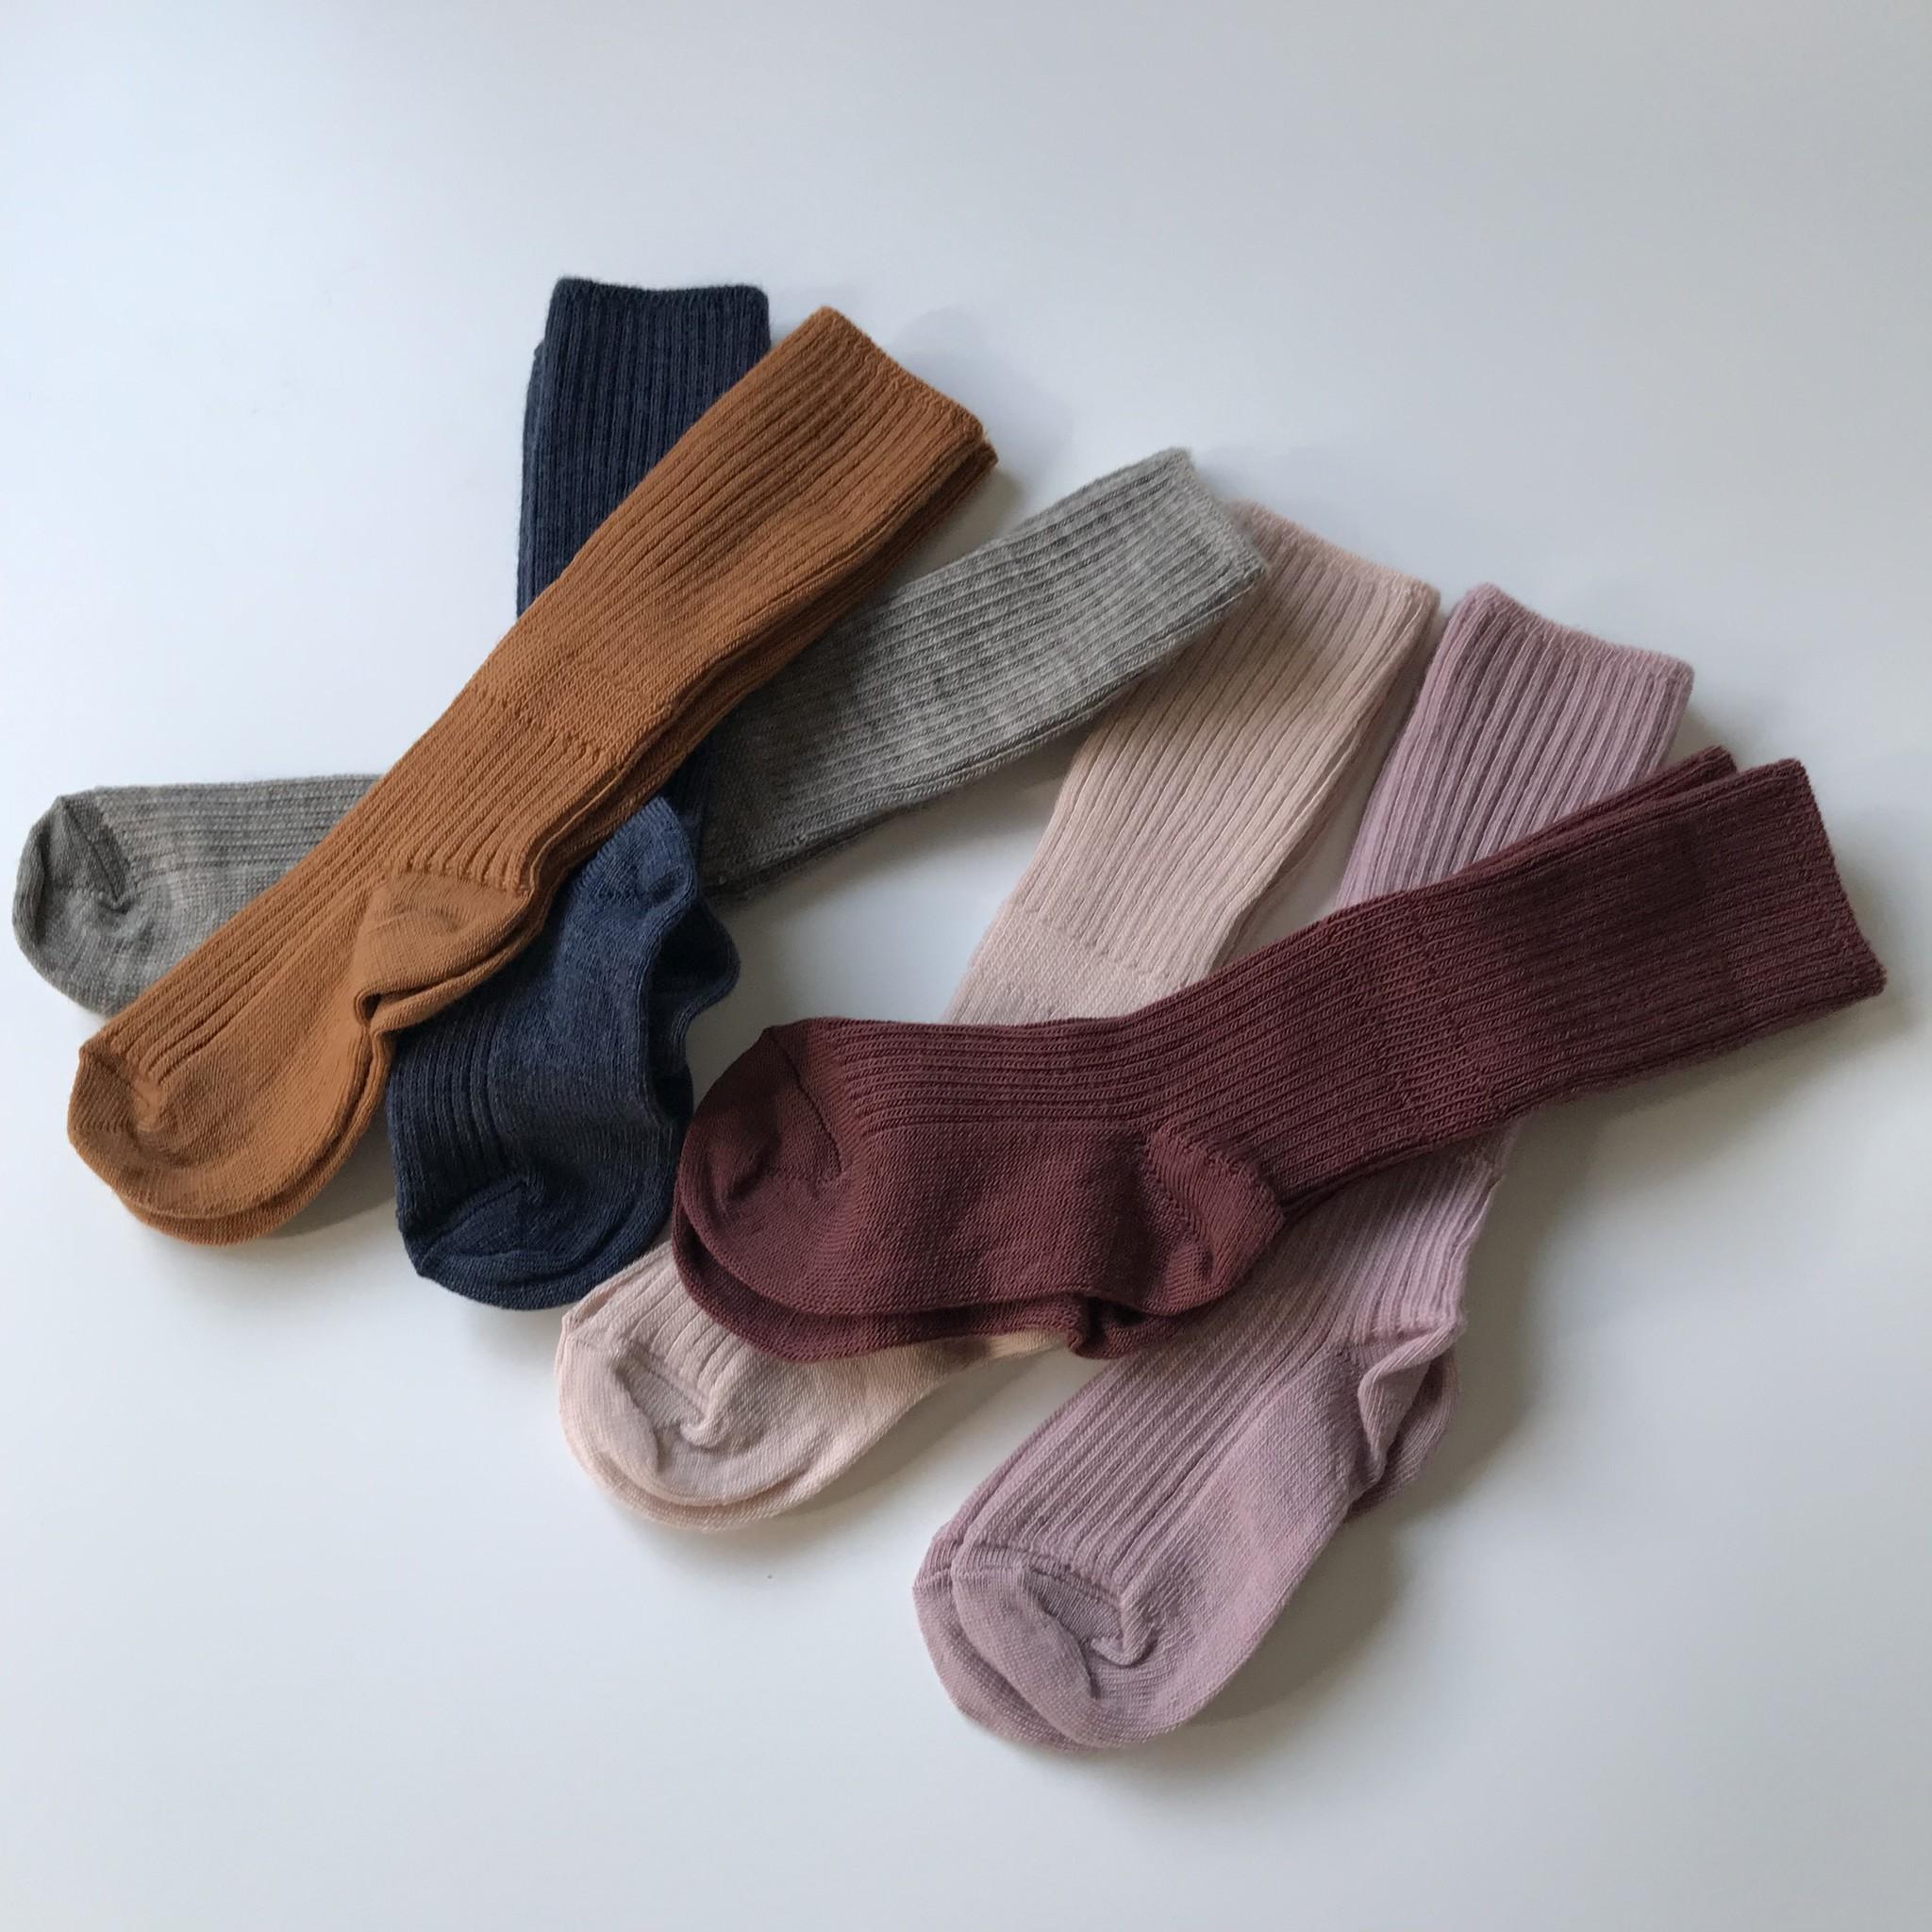 MP Denmark wollen kniekousjes - 80% merino wool - licht roze - maat 15 tm 32